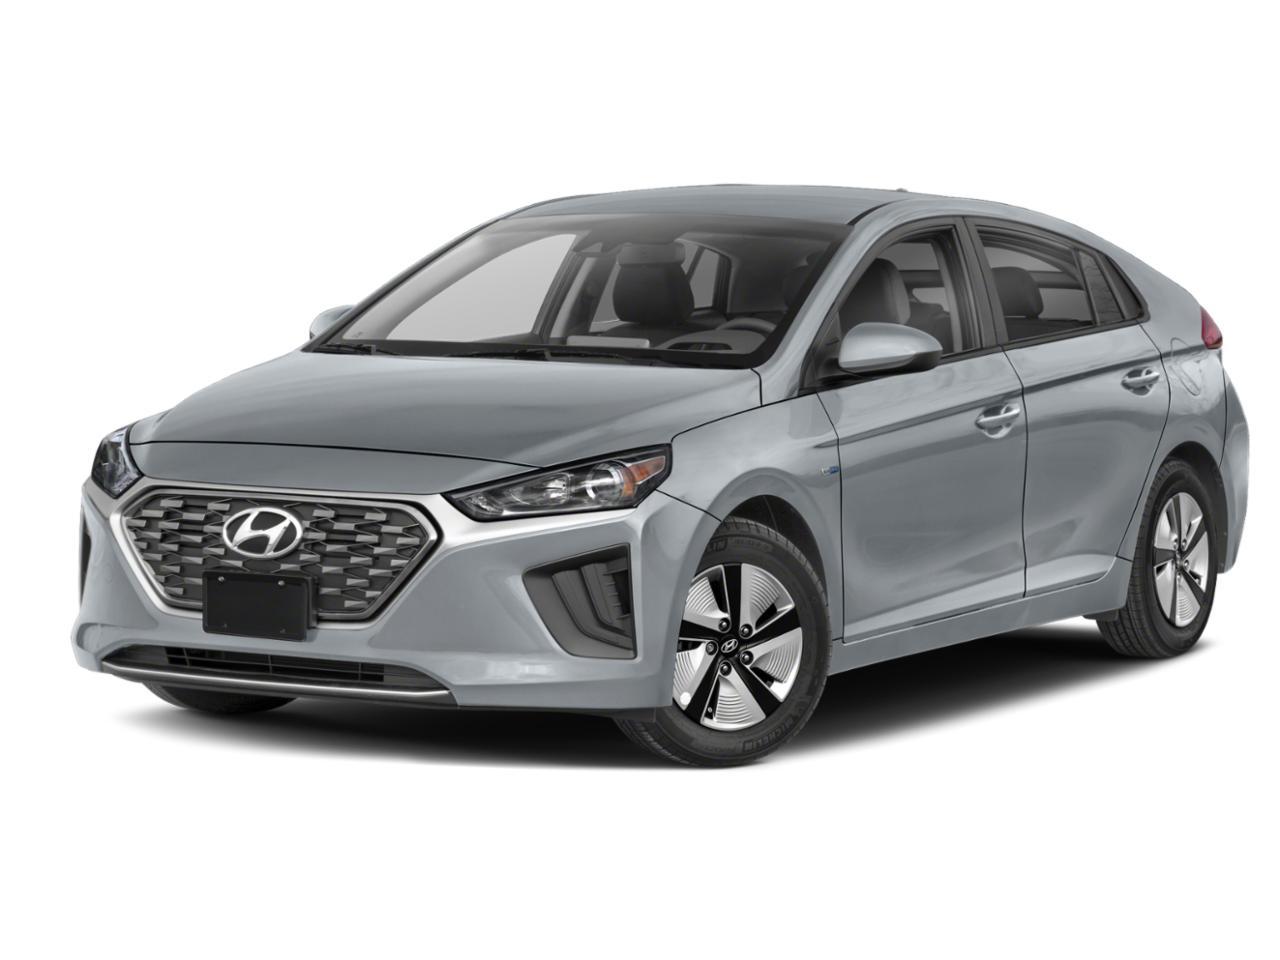 2022 Hyundai IONIQ Hybrid Vehicle Photo in Longmont, CO 80501